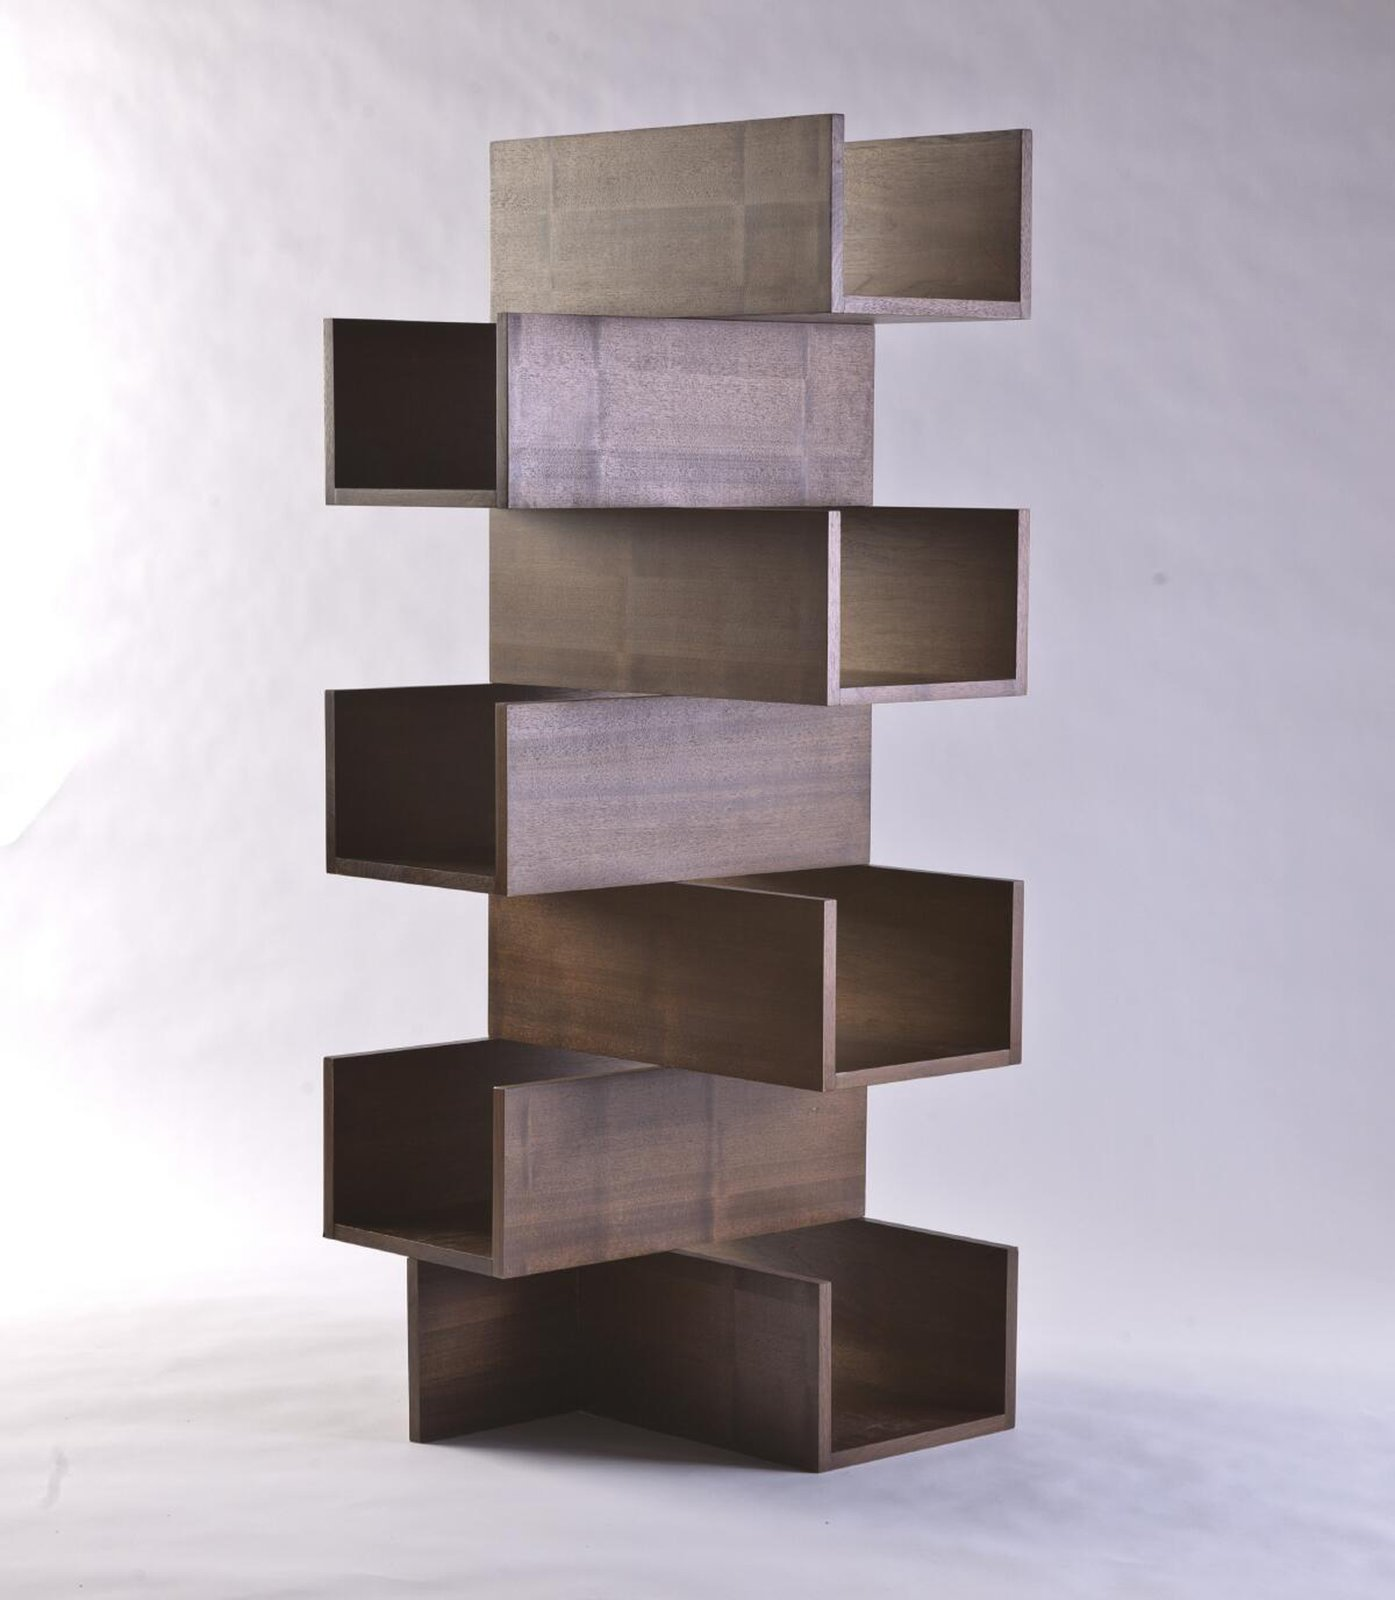 Photo 4 of 7 in Data Modern Furnishings